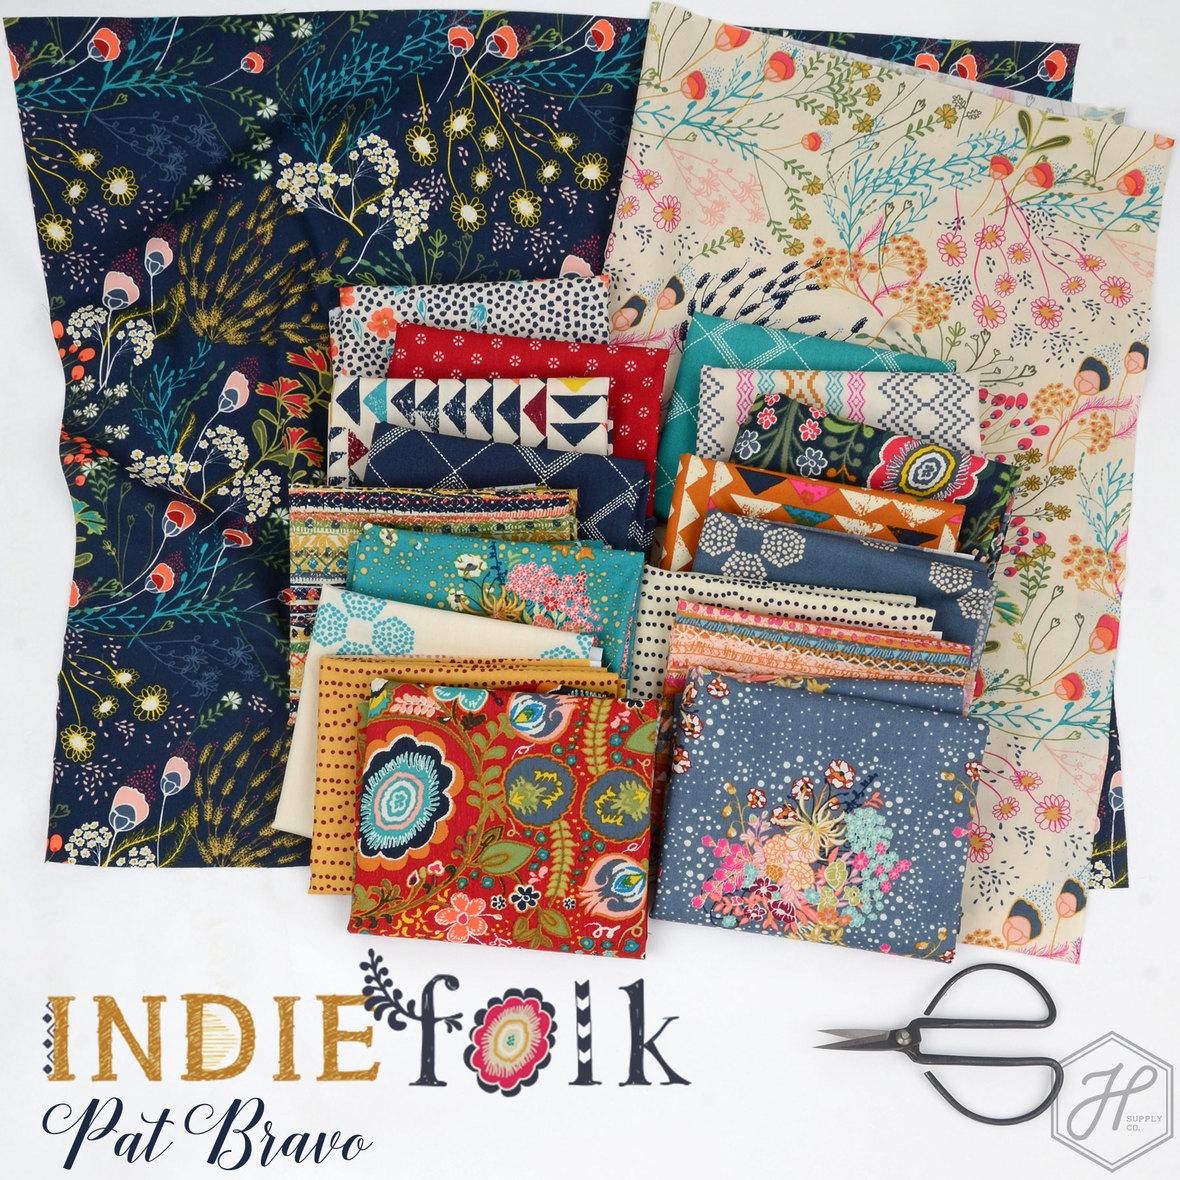 Indie-Folk-Pat-Bravo-fabric-at-Hawthorne-Supply-Co.